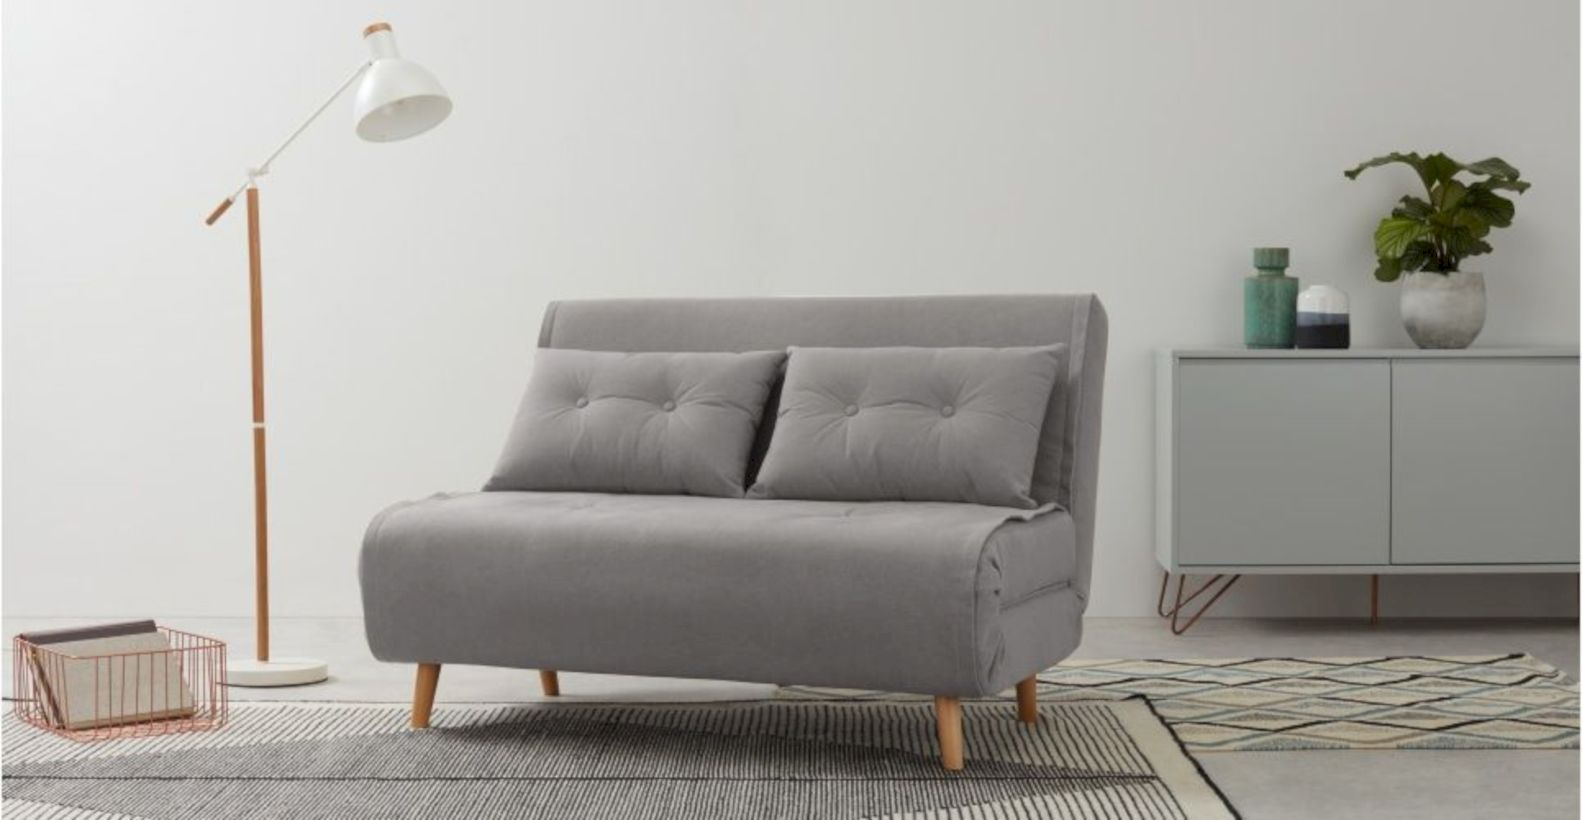 48 Impressive Sofa Bed Design Ideas Small Sofa Bed Small Sofa